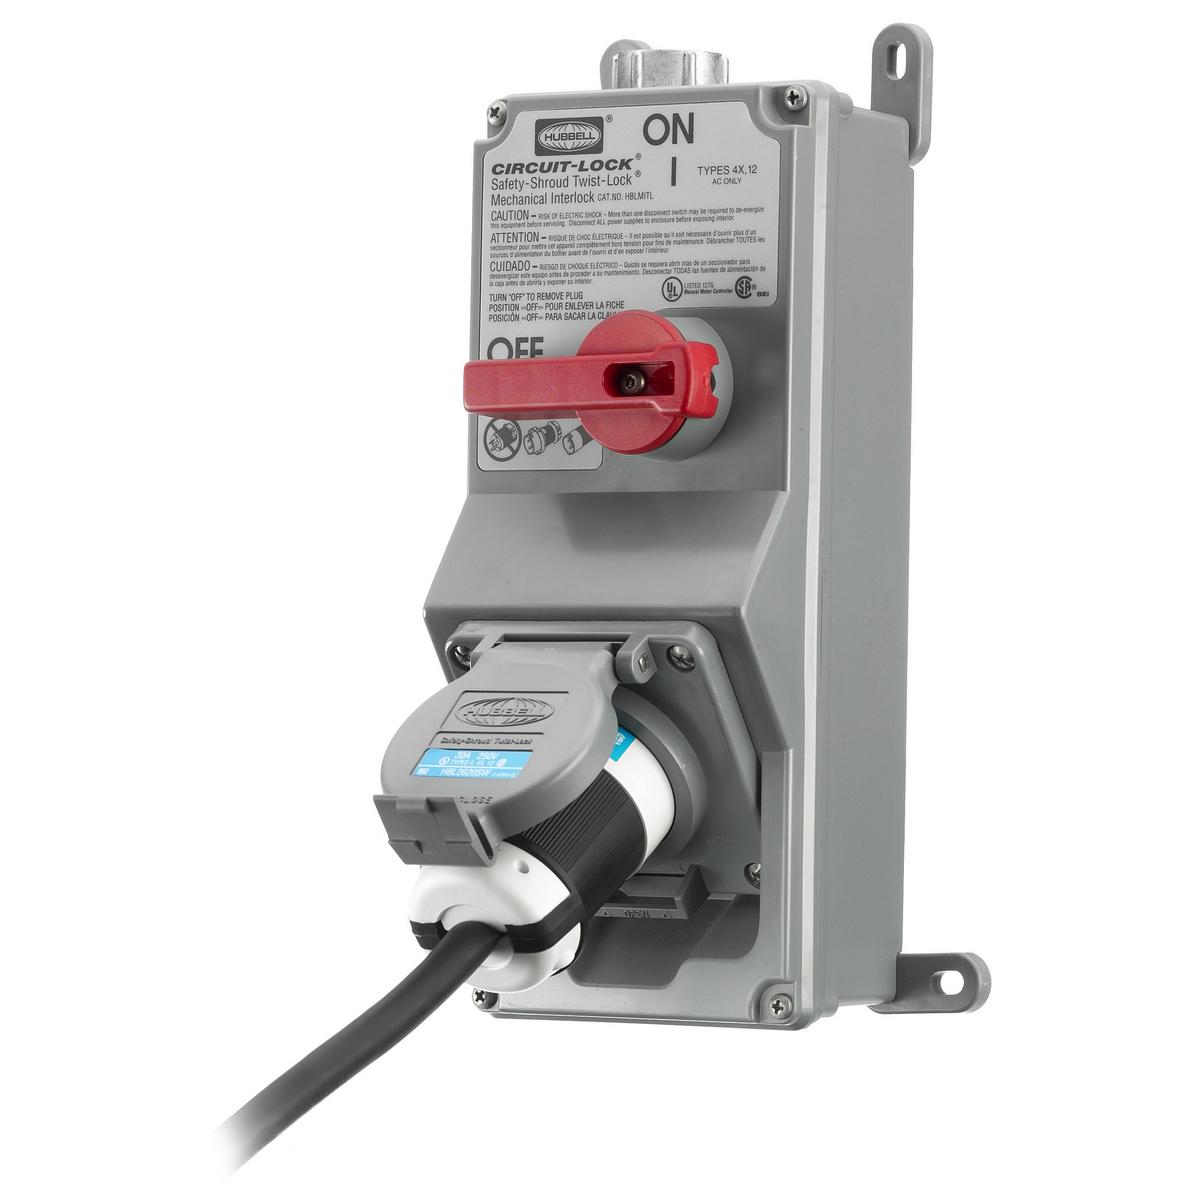 Hblmitl Wdk Brand Hubbell Wiring Mechanical Brake Switch